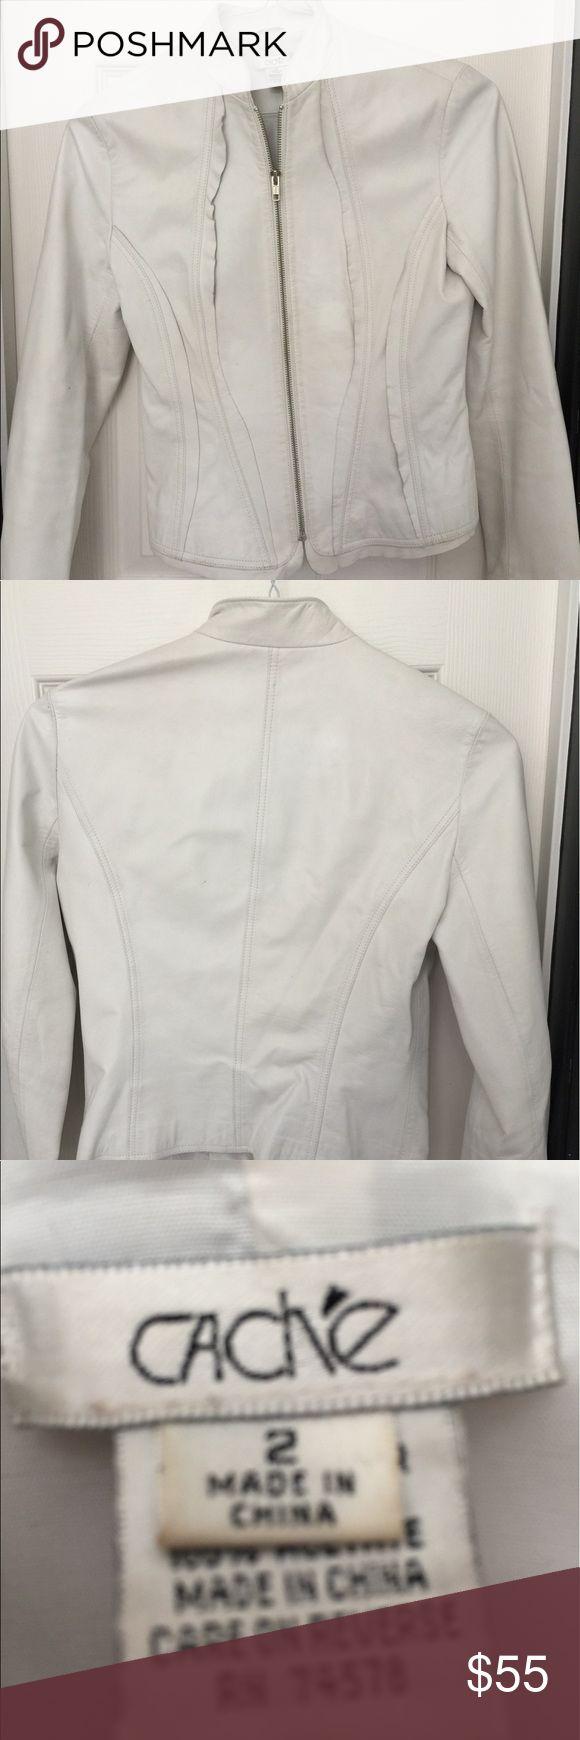 Cache white leather jacket size 2 Cache white leather jacket size 2 Cache Jackets & Coats